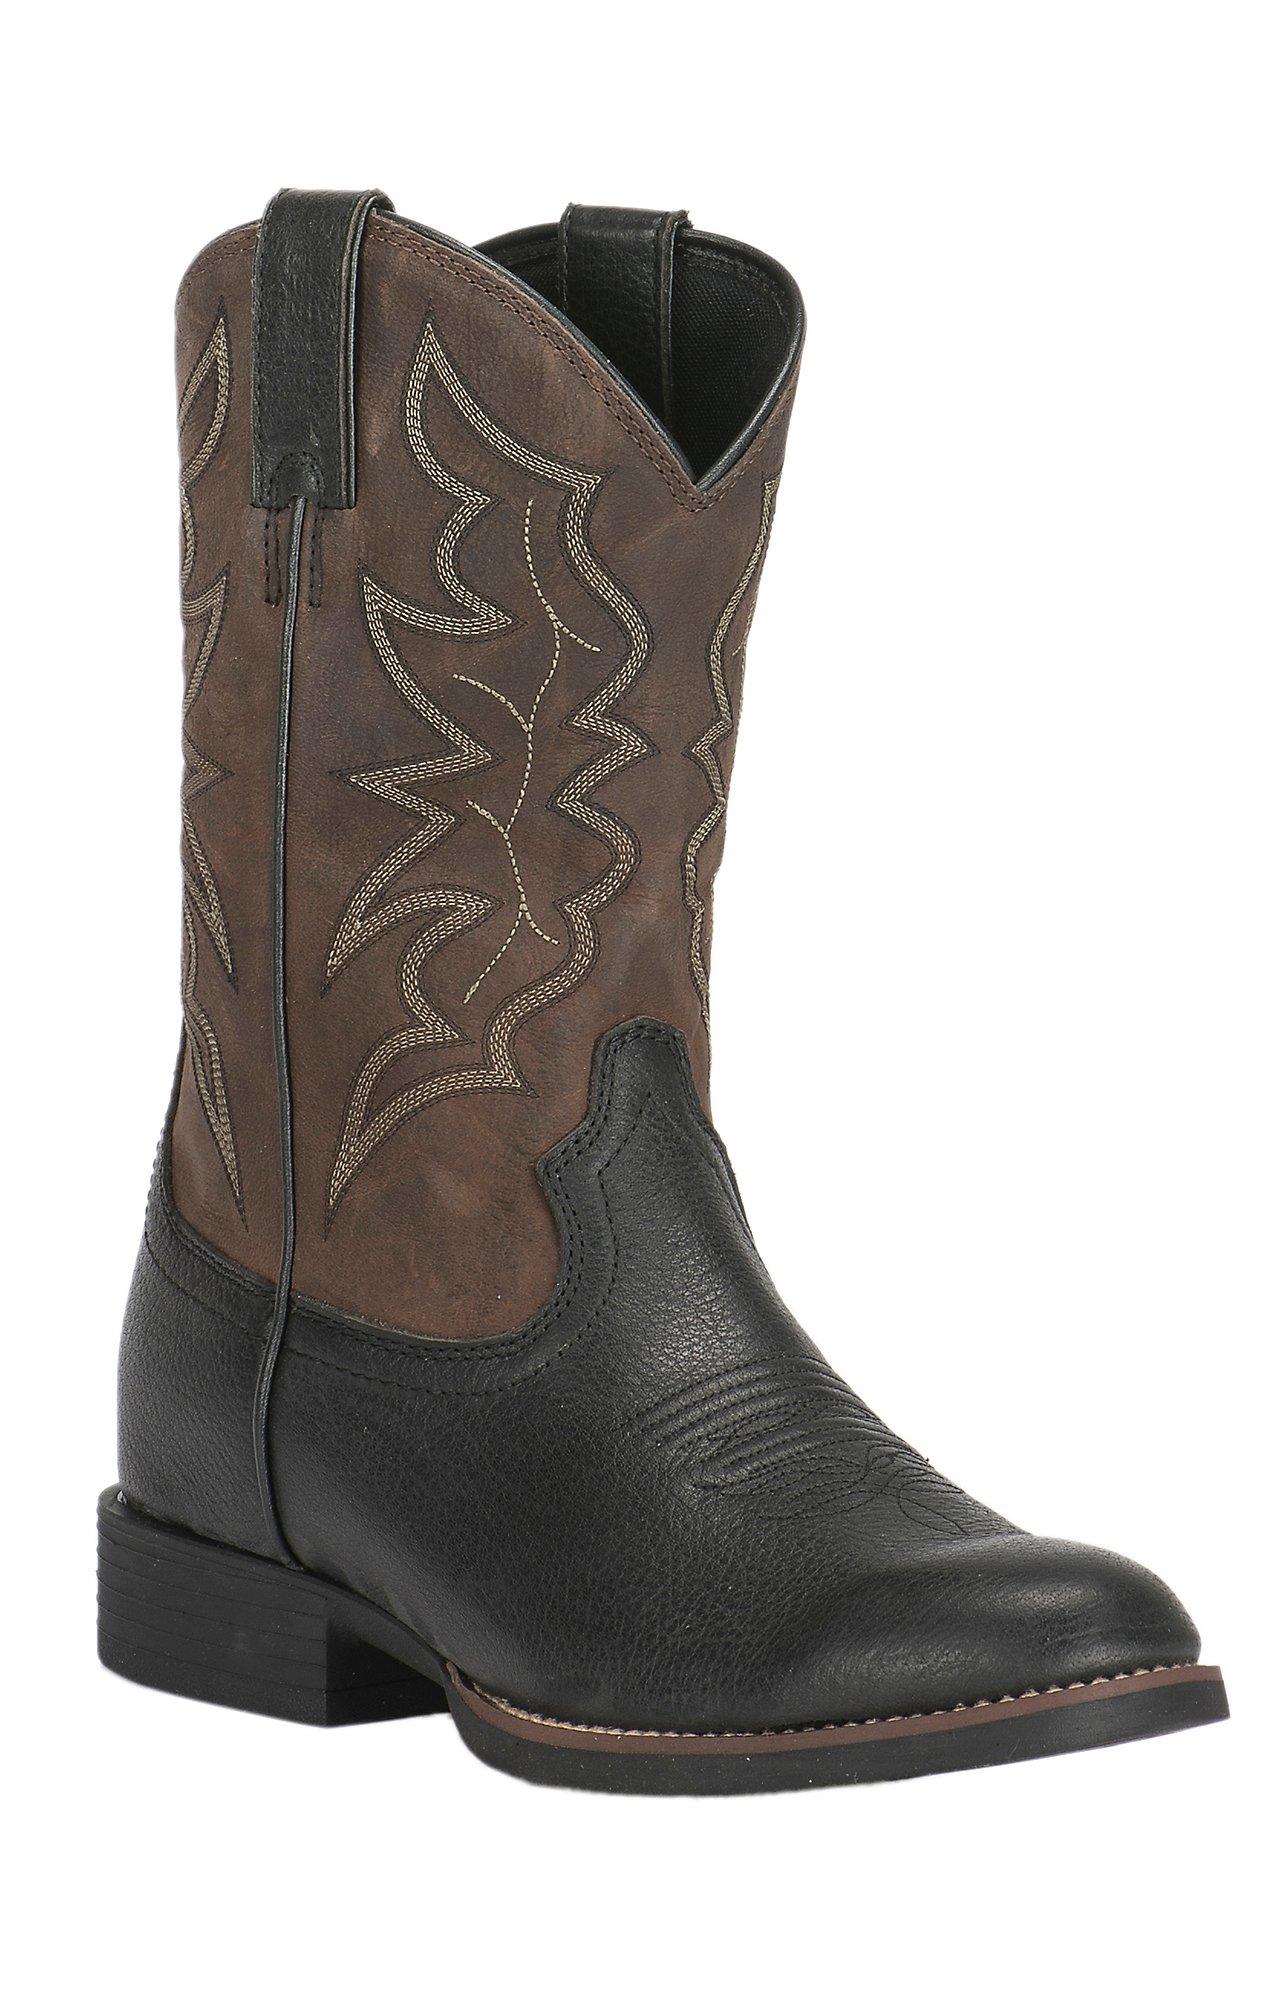 Men's Cowboy Boots & Western Boots for Men   Cavender's